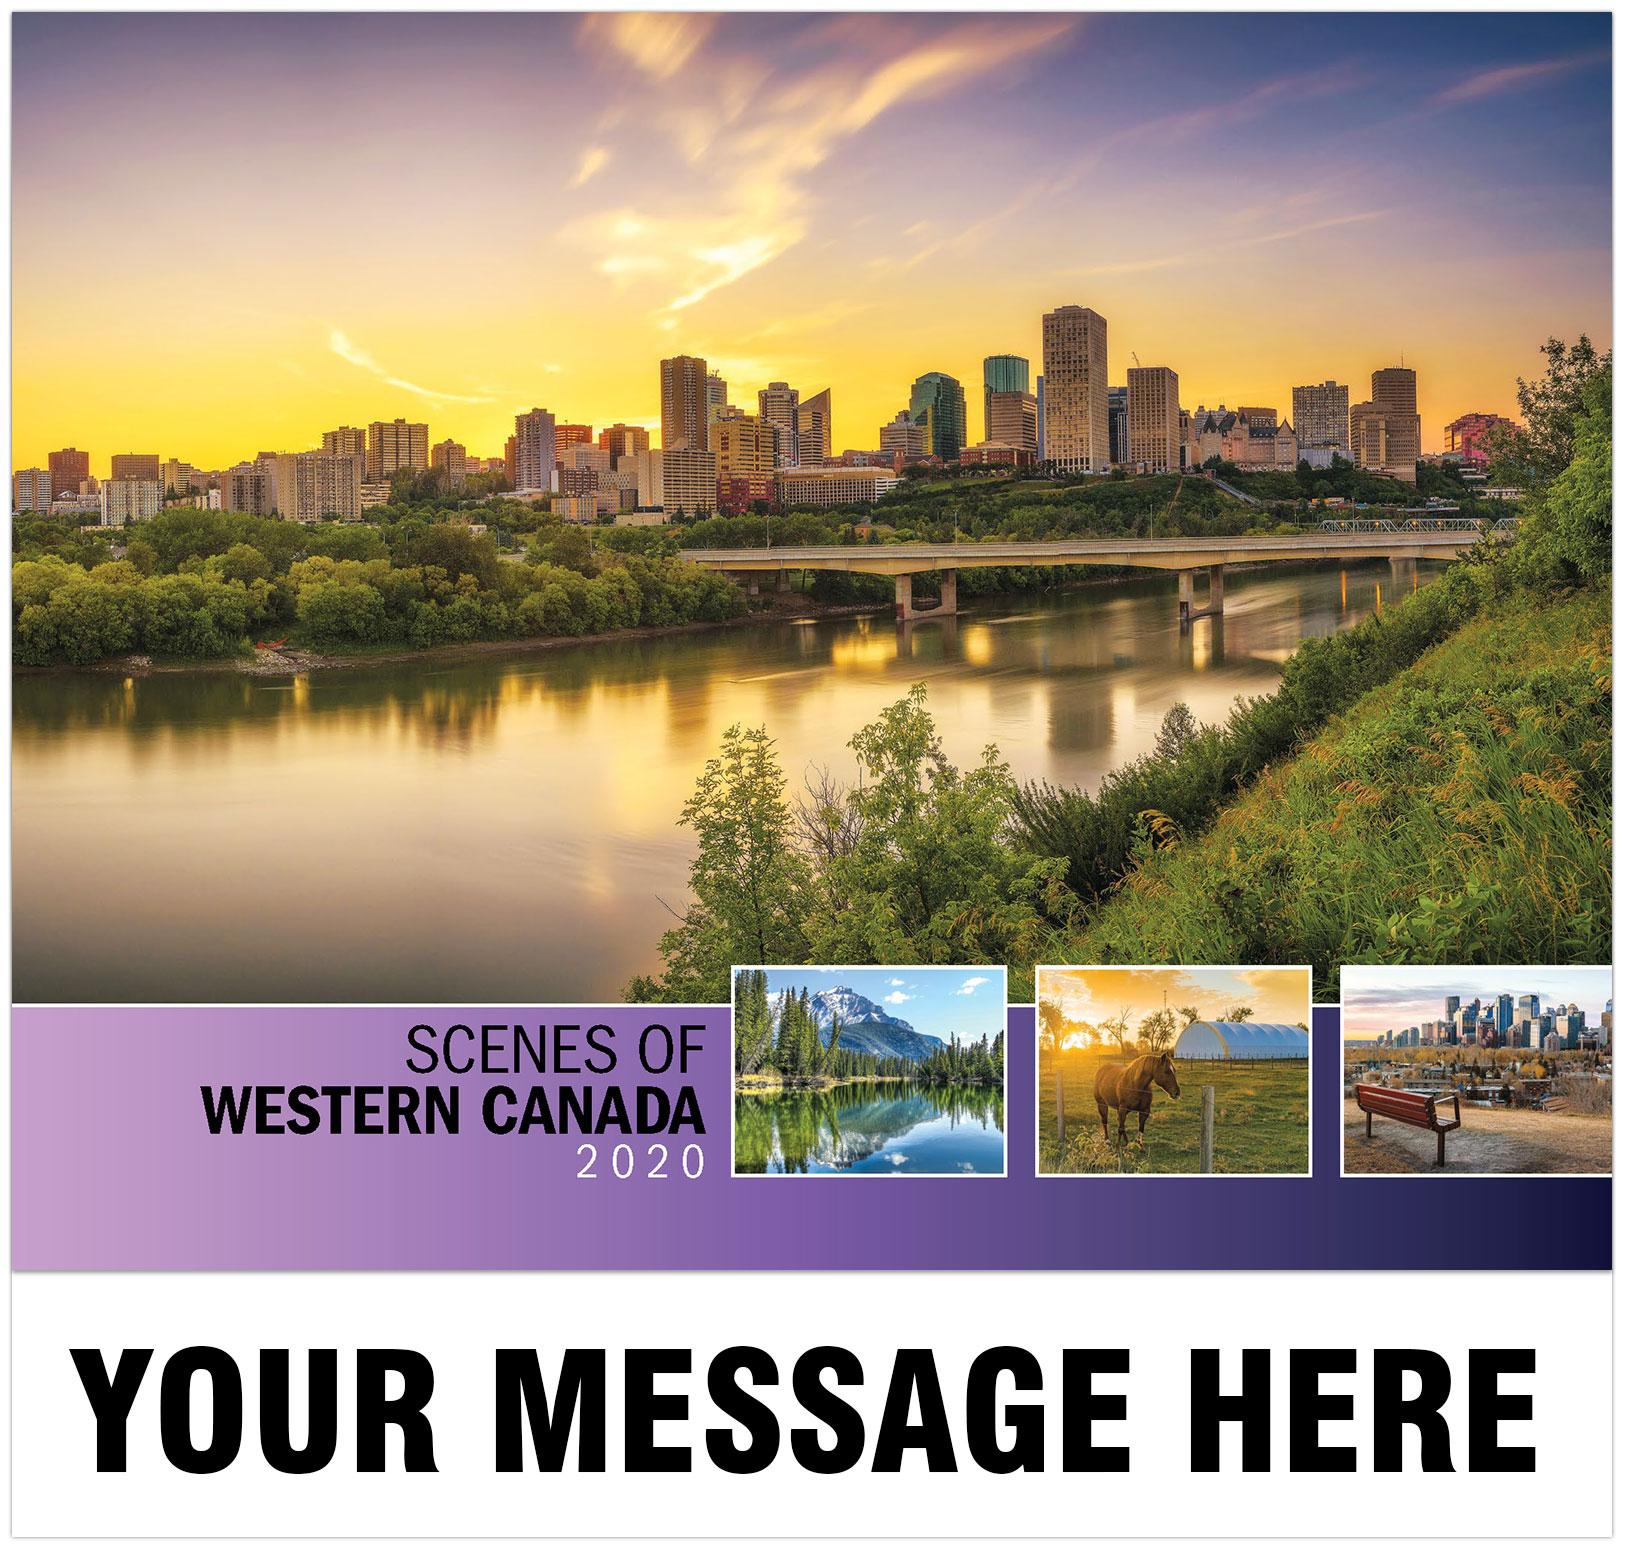 Scenes of Western Canada